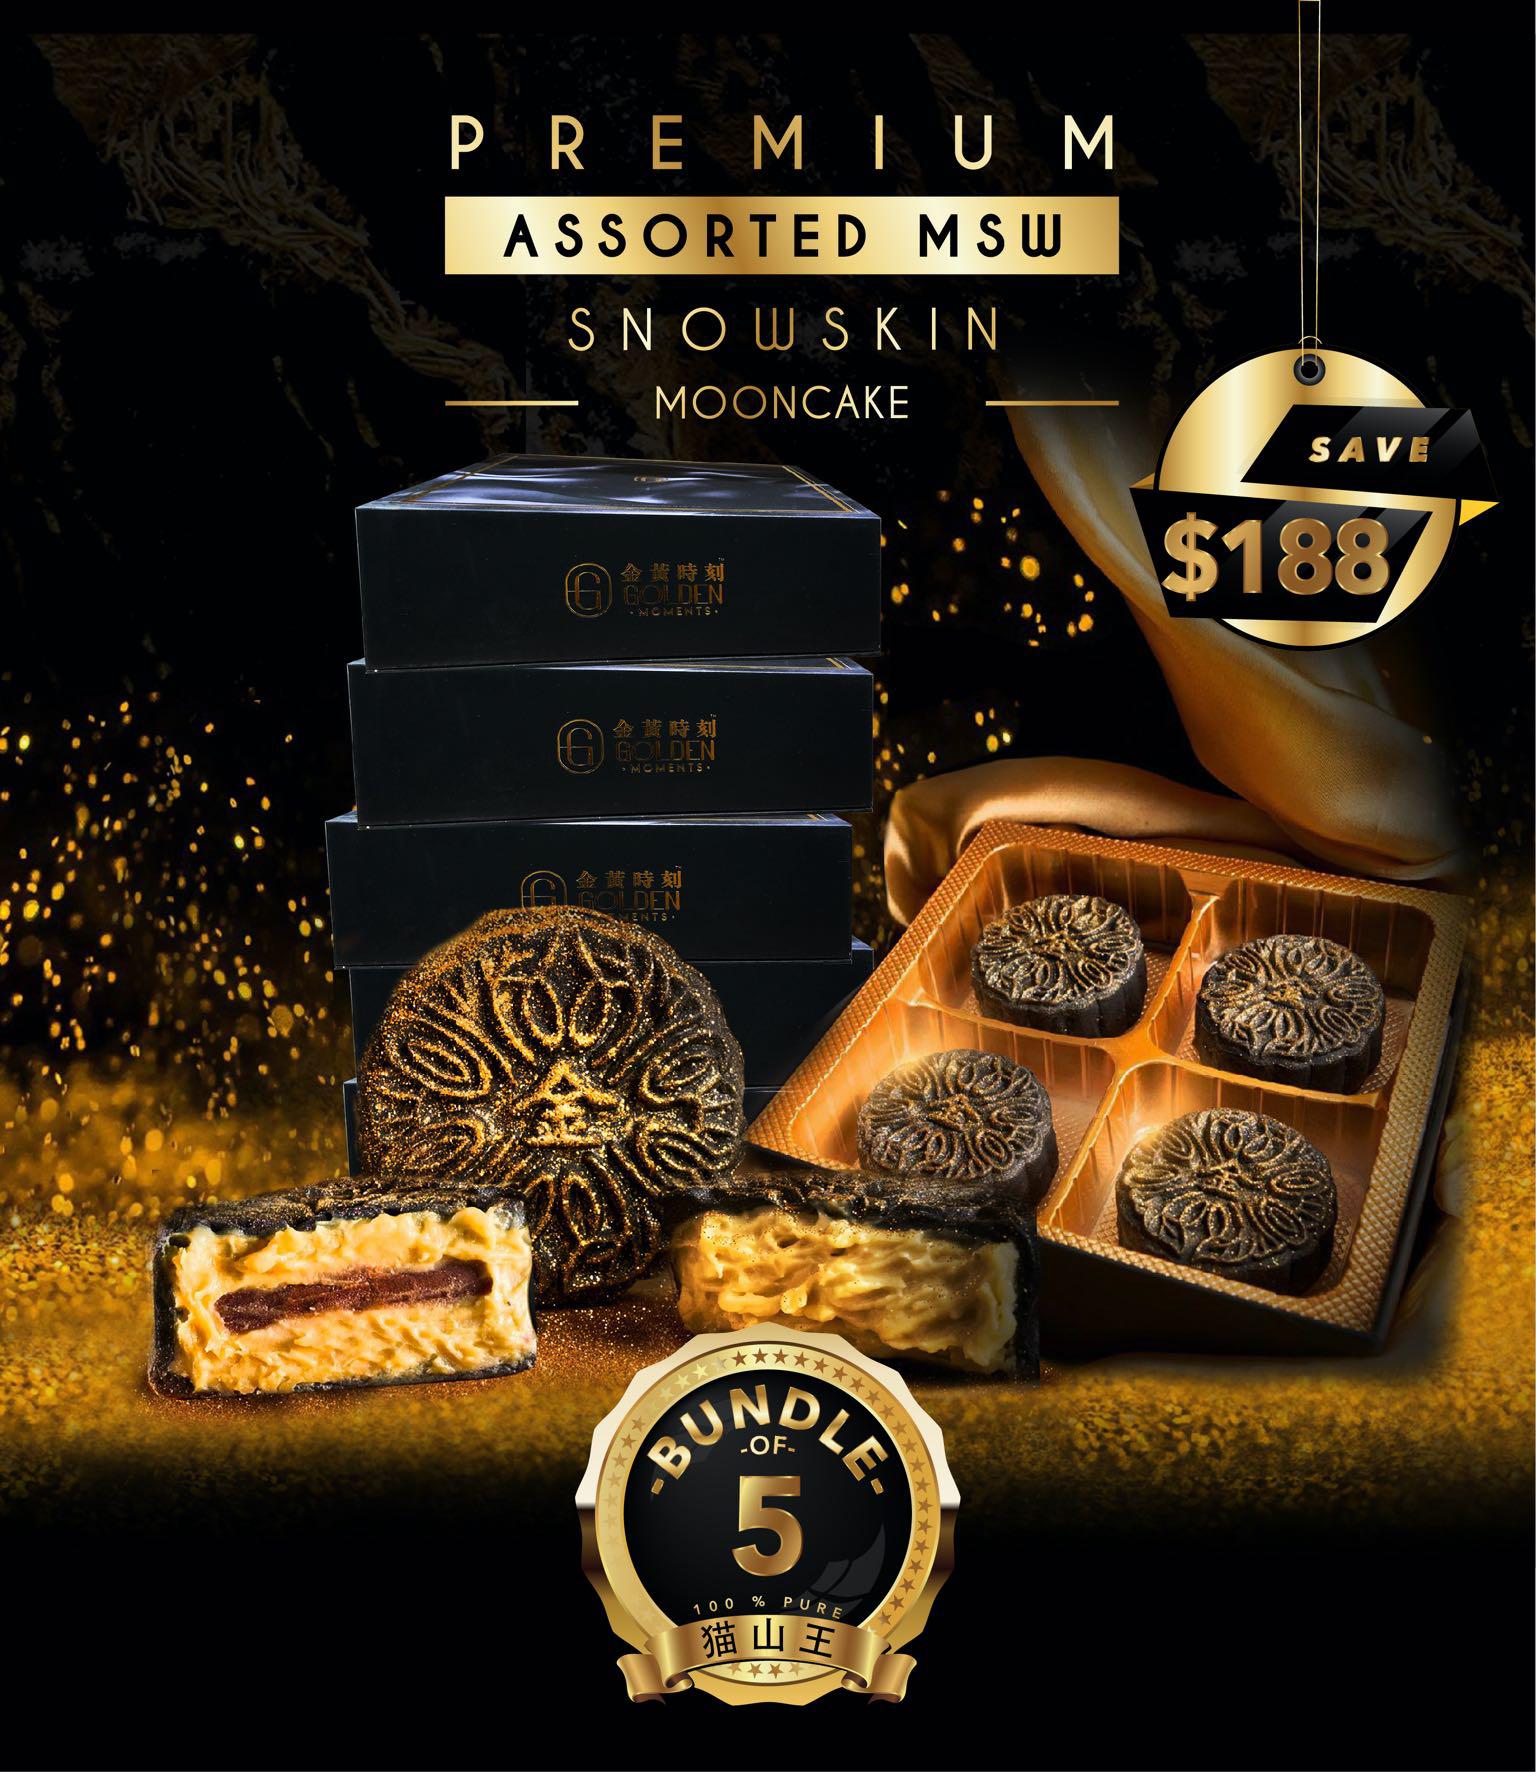 Assorted Mao Shan Wang Snowskin Mooncake (Box of 4) - Bundle of 5 (SAVE $188)